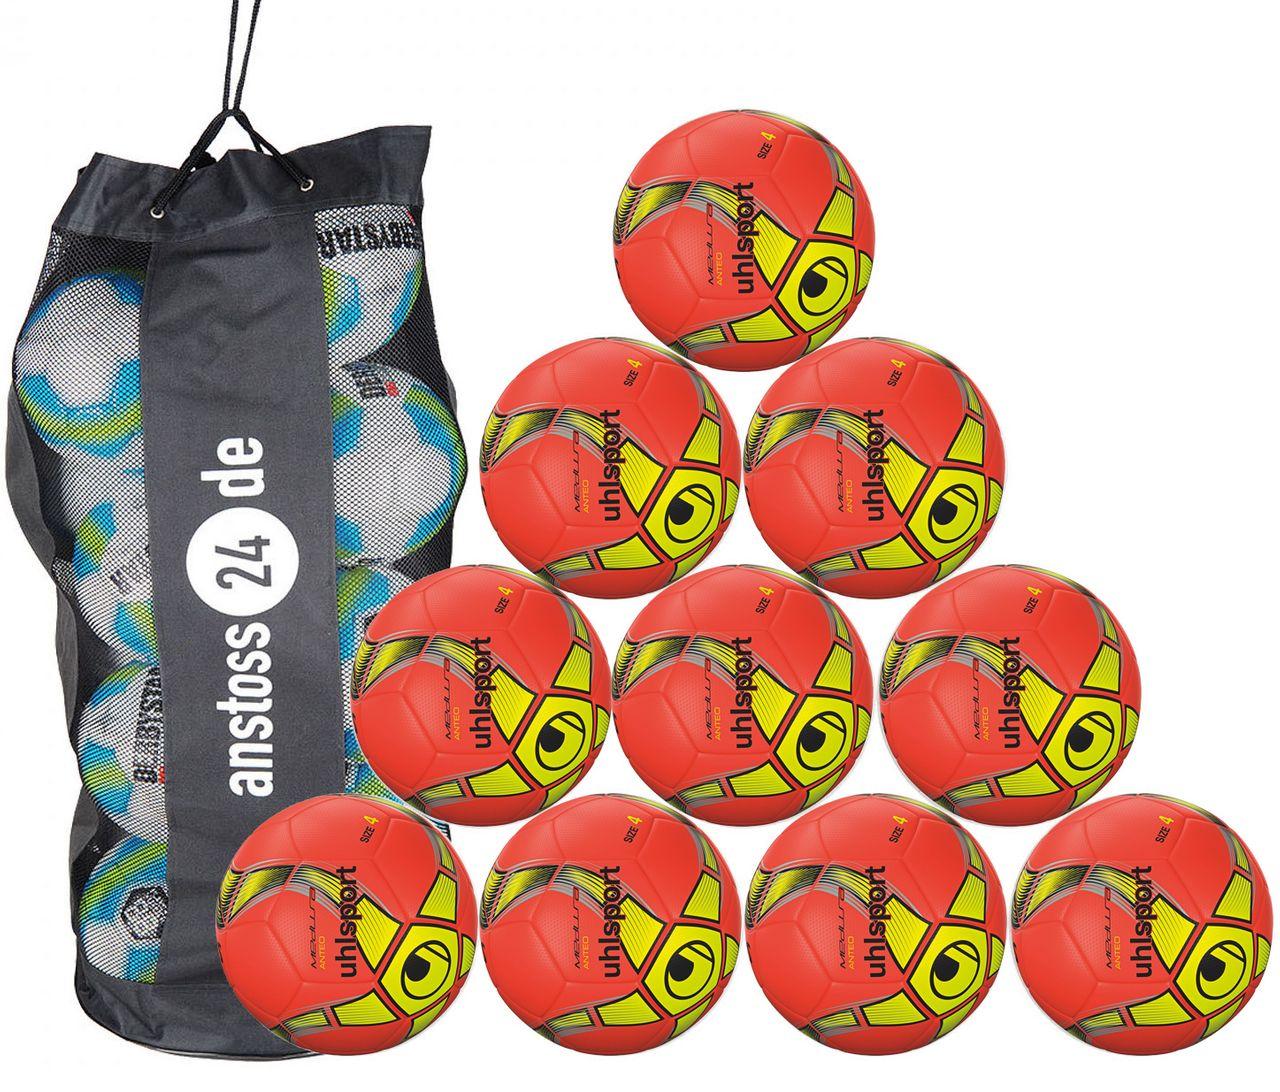 10 x Uhlsport Trainingsball Futsal - MEDUSA ANTEO inkl. Ballsack